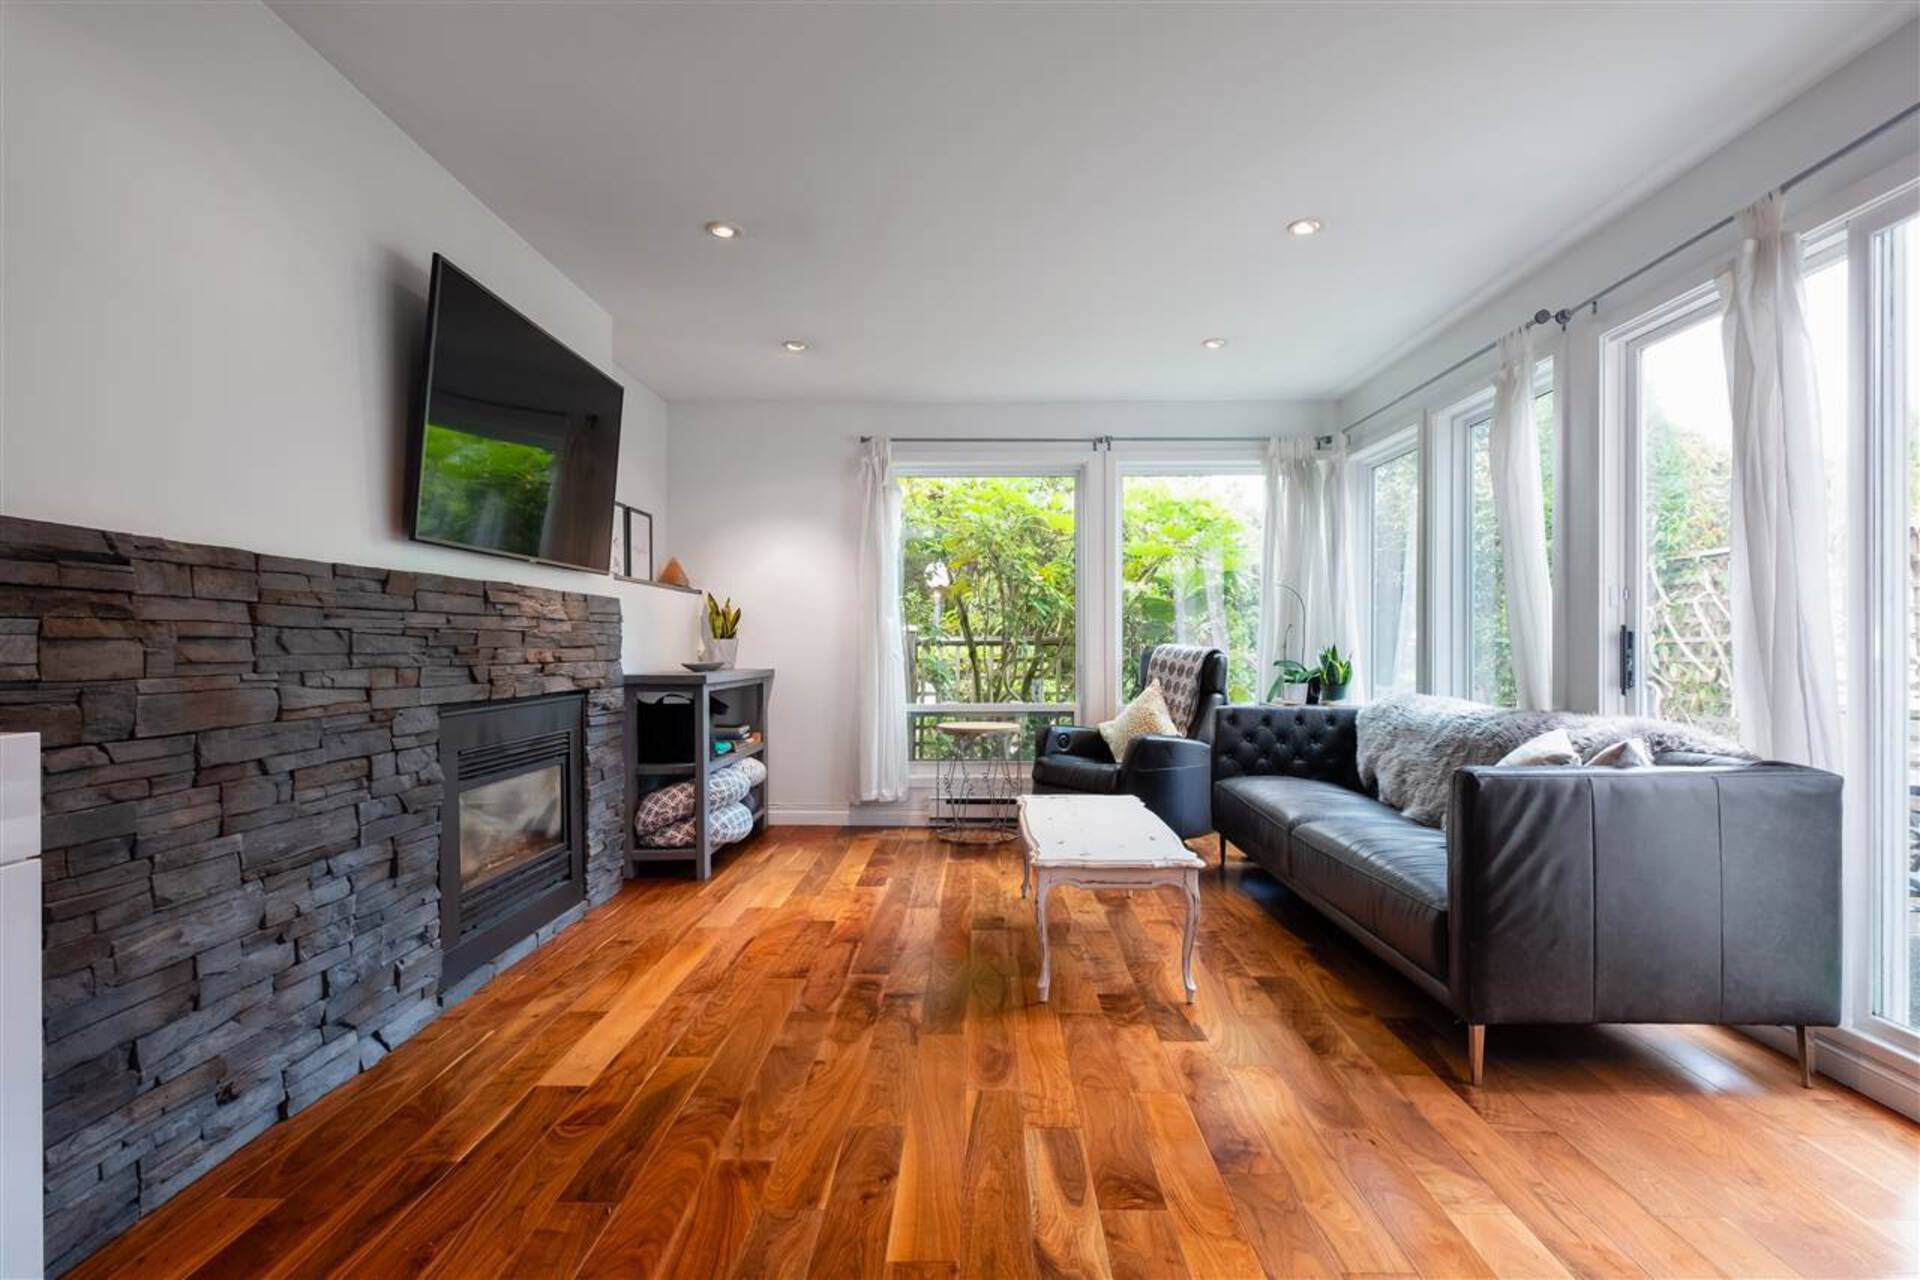 2536-cornwall-avenue-kitsilano-vancouver-west-03 at 2536 Cornwall Avenue, Kitsilano, Vancouver West